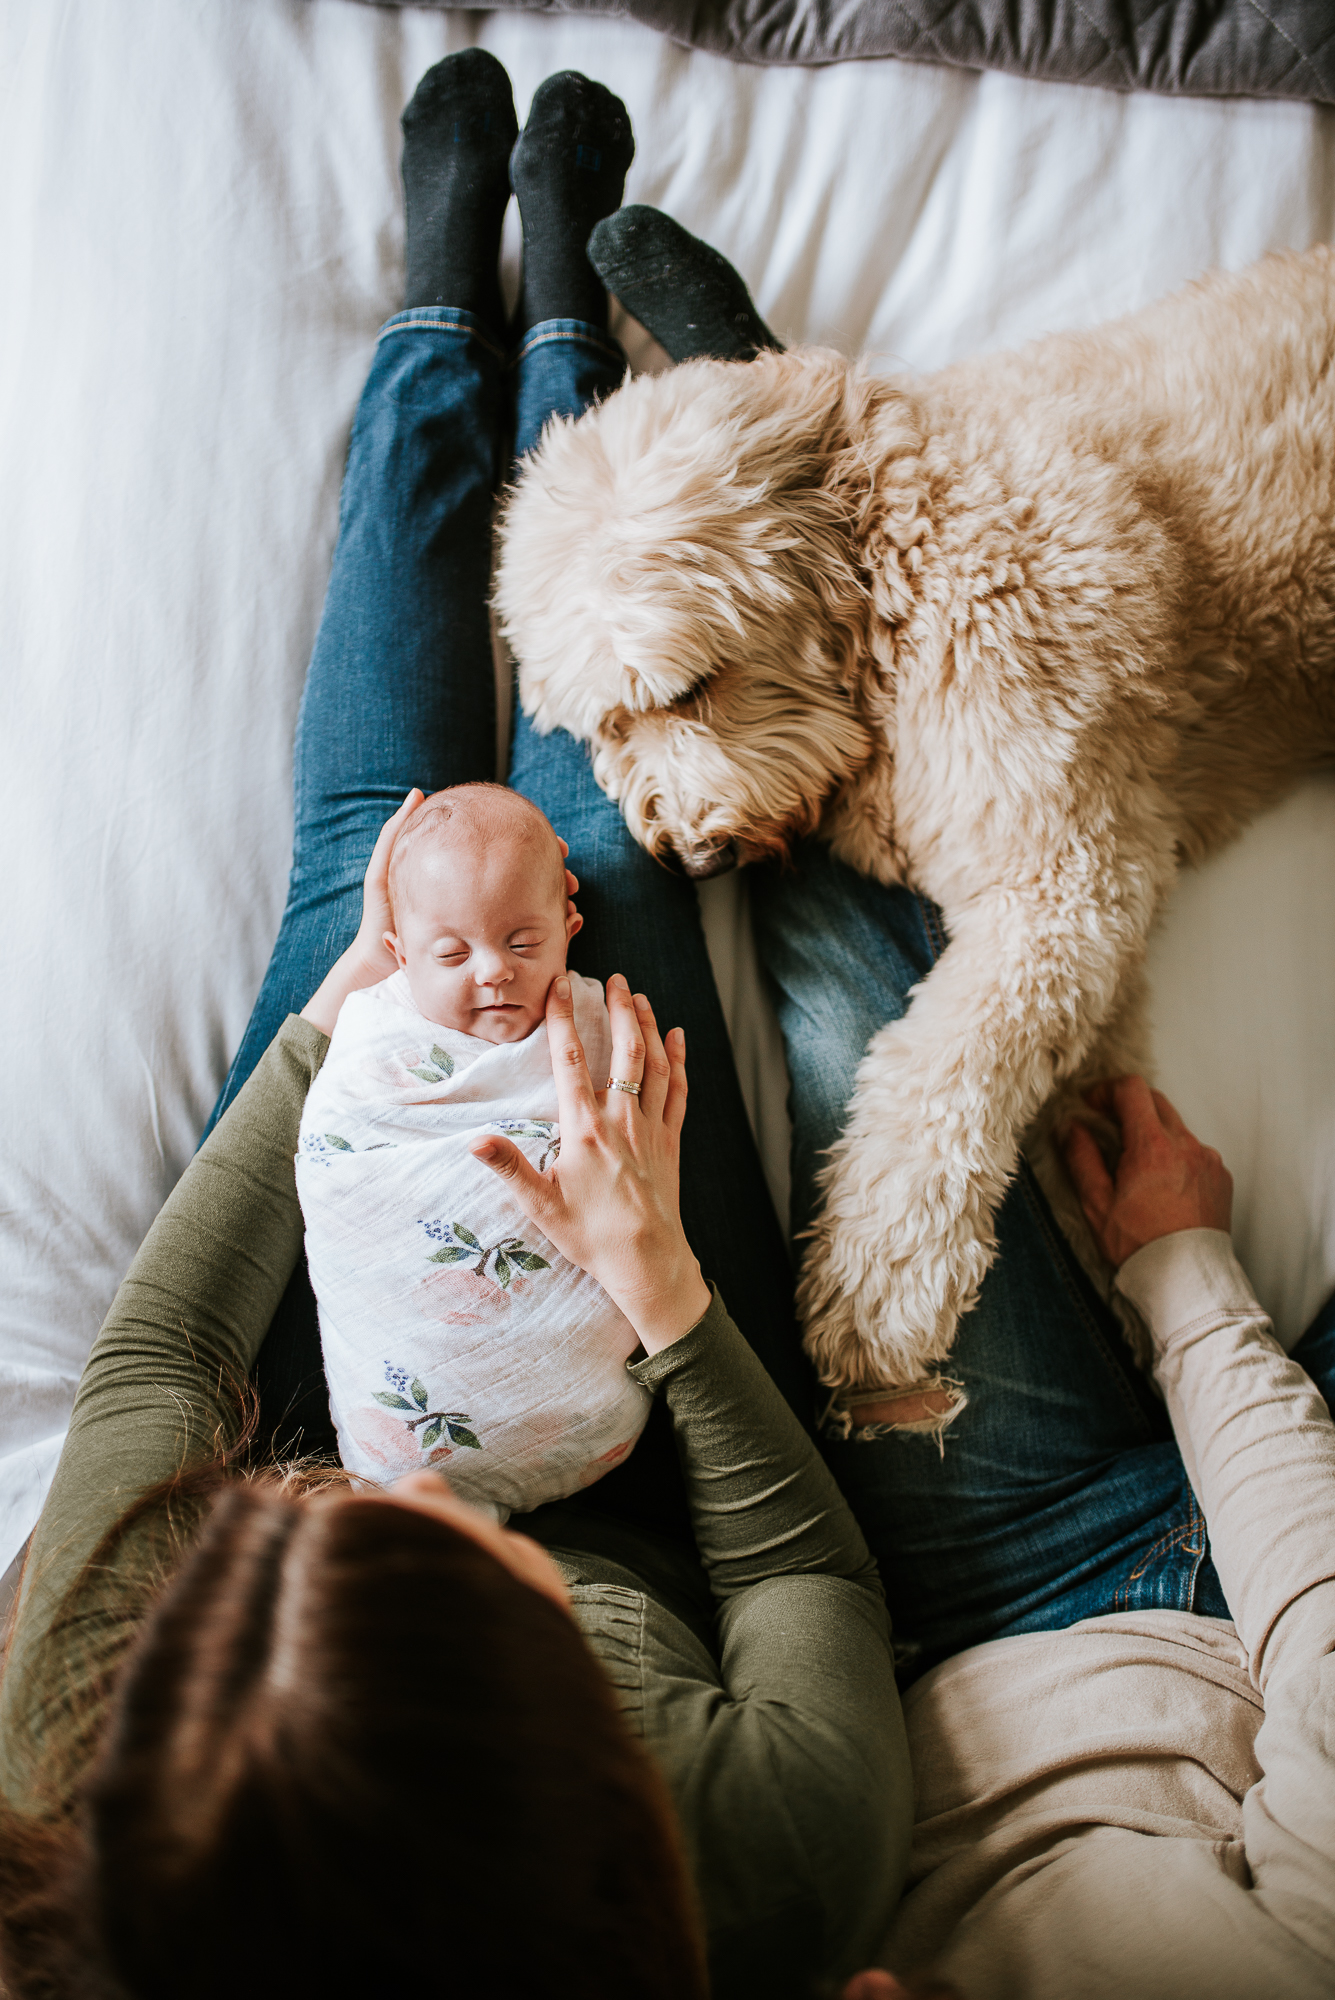 nataliethomasphotography.com-in-home-newborn-session-4519.jpg